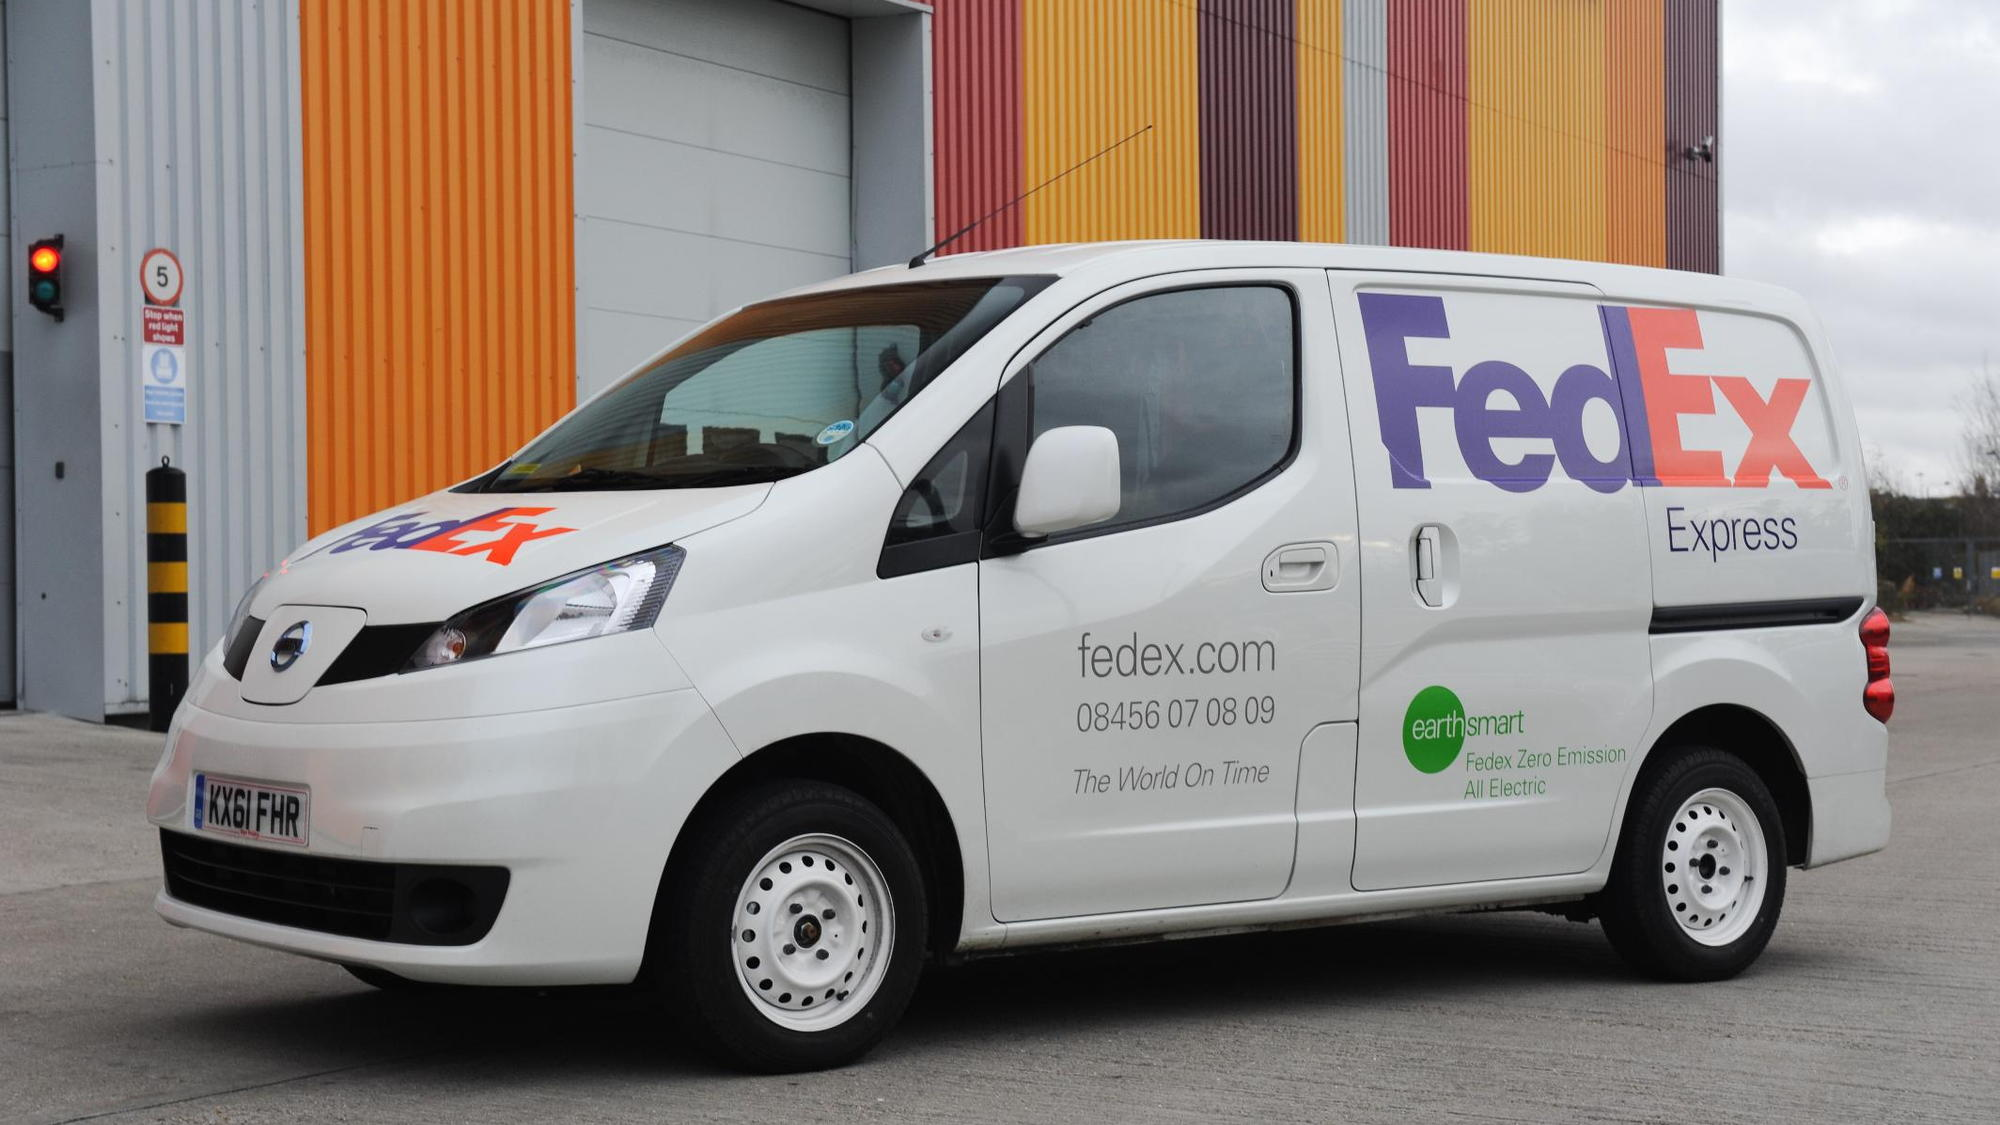 FedEx to use Nissan NV200 electric van in London